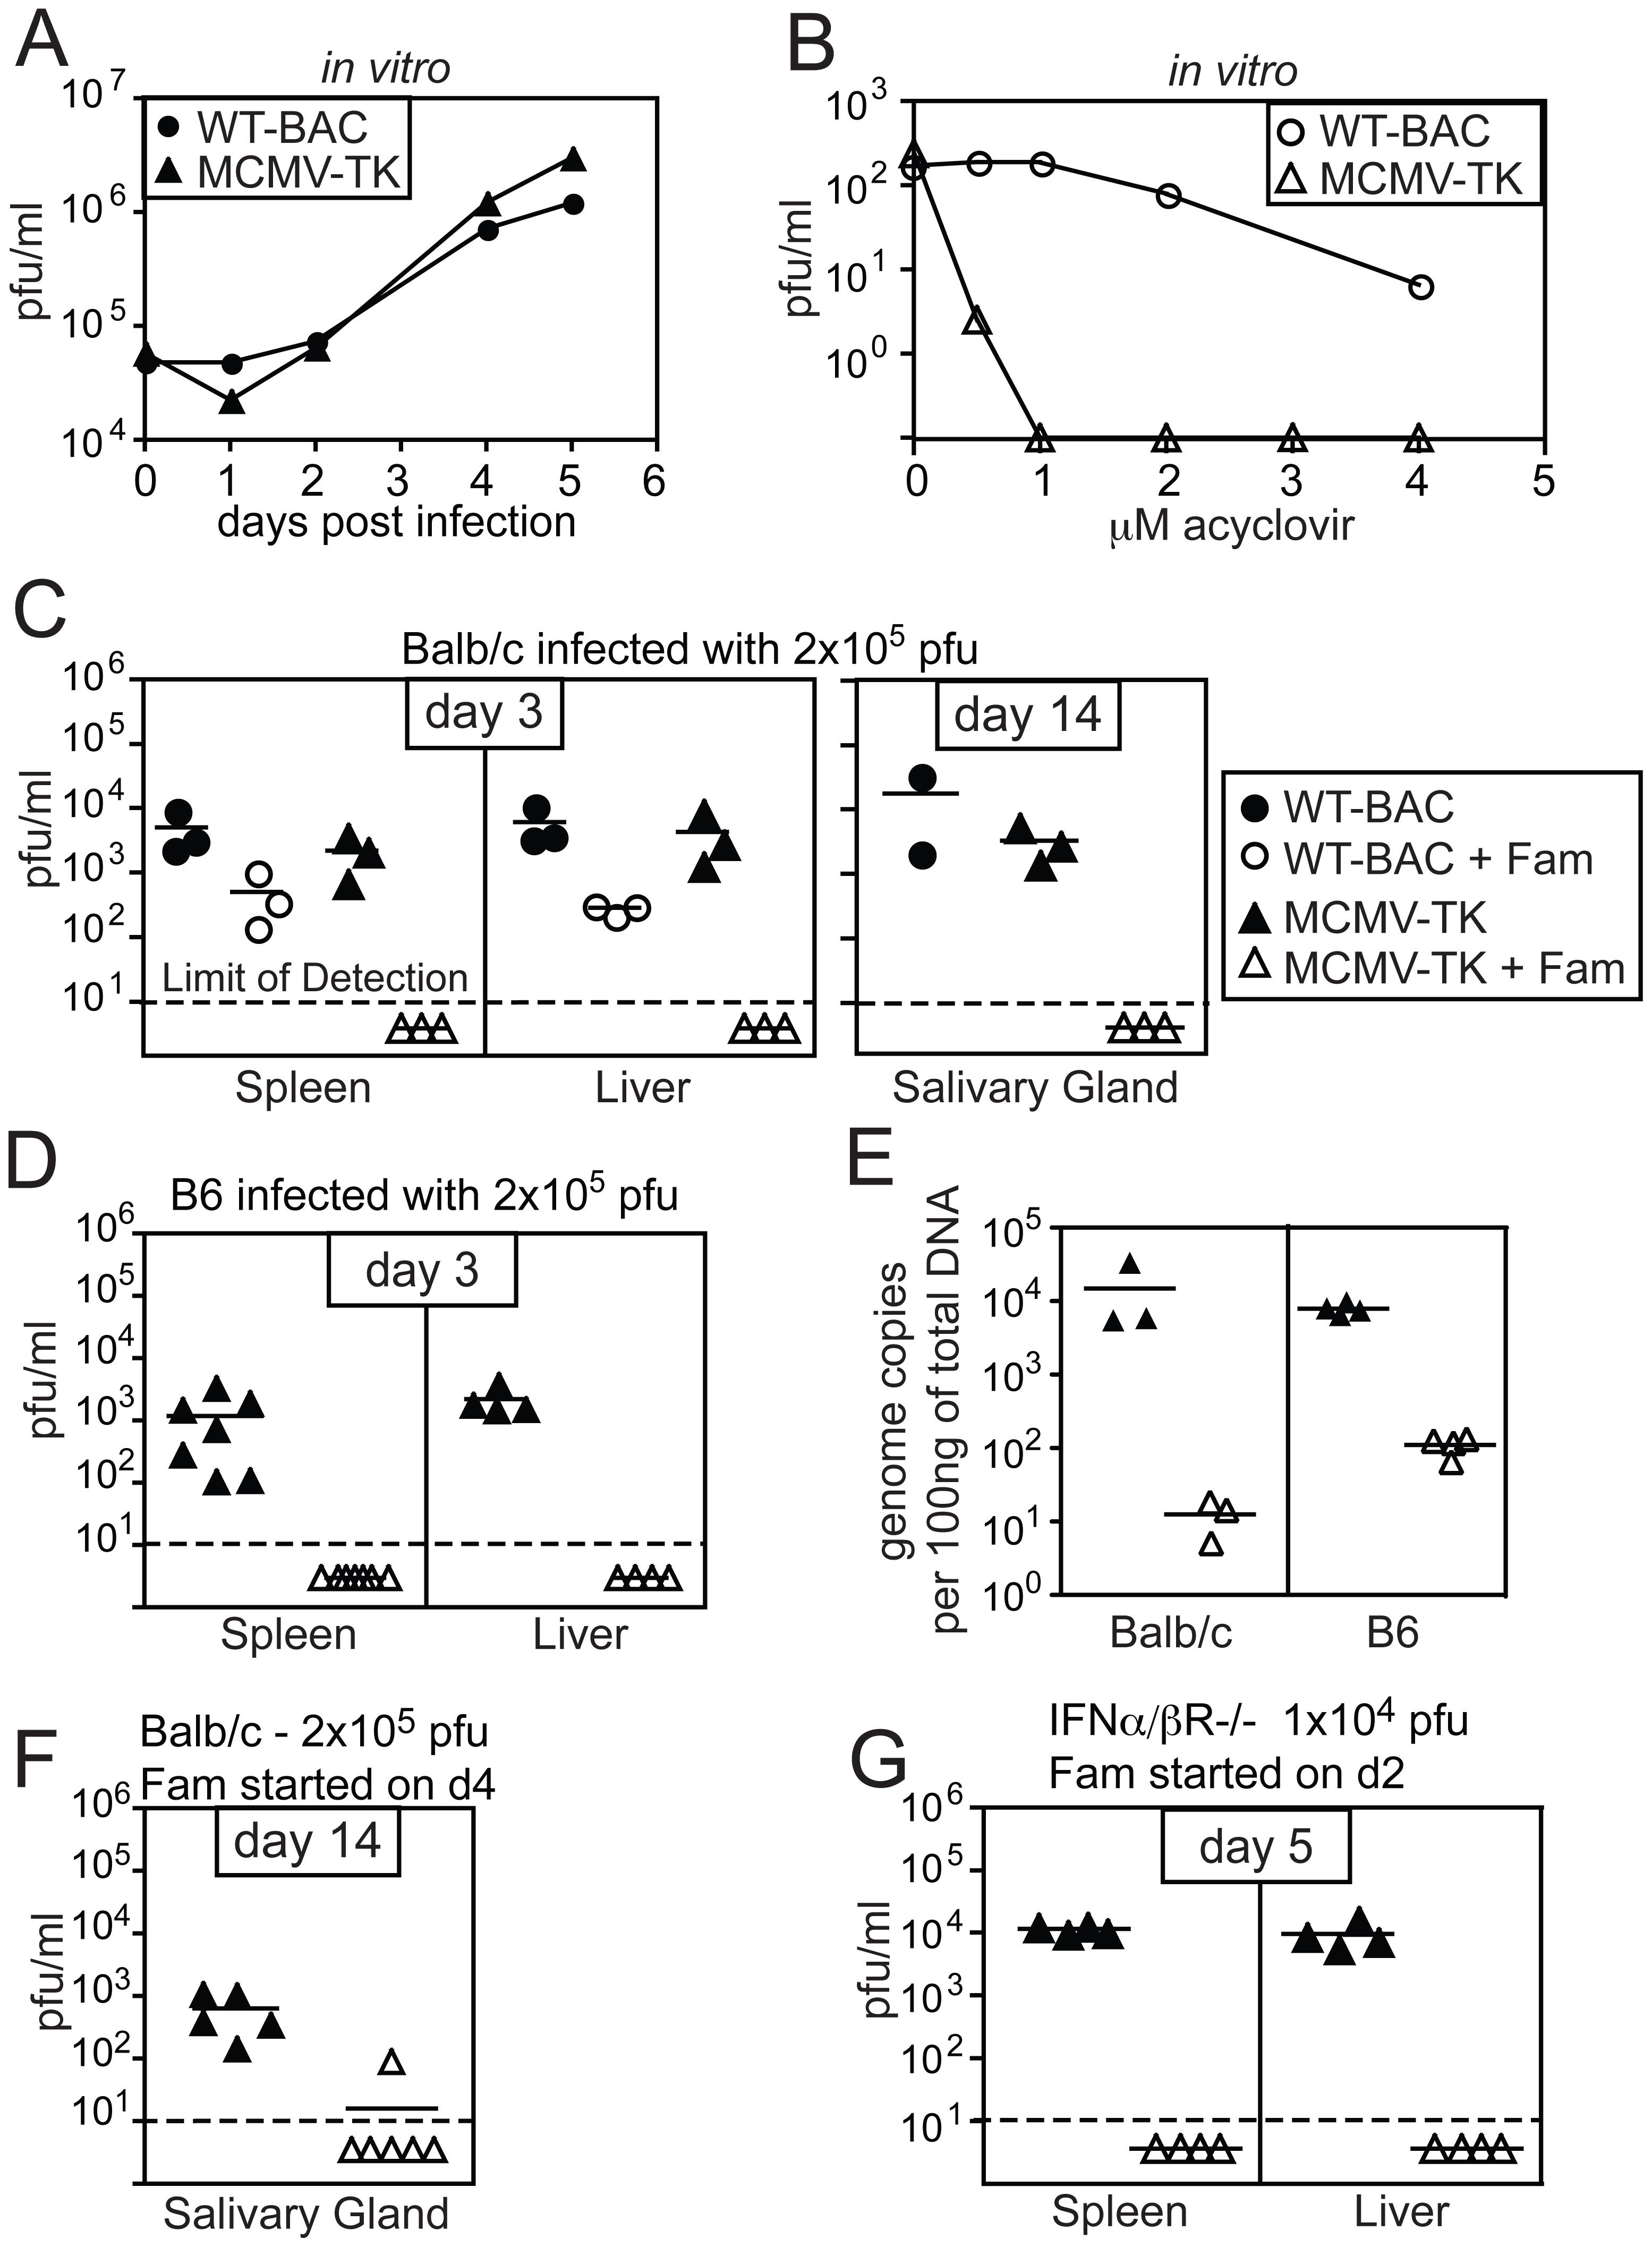 Replication of MCMV-TK is inhibited by acyclovir or famcyclovir.